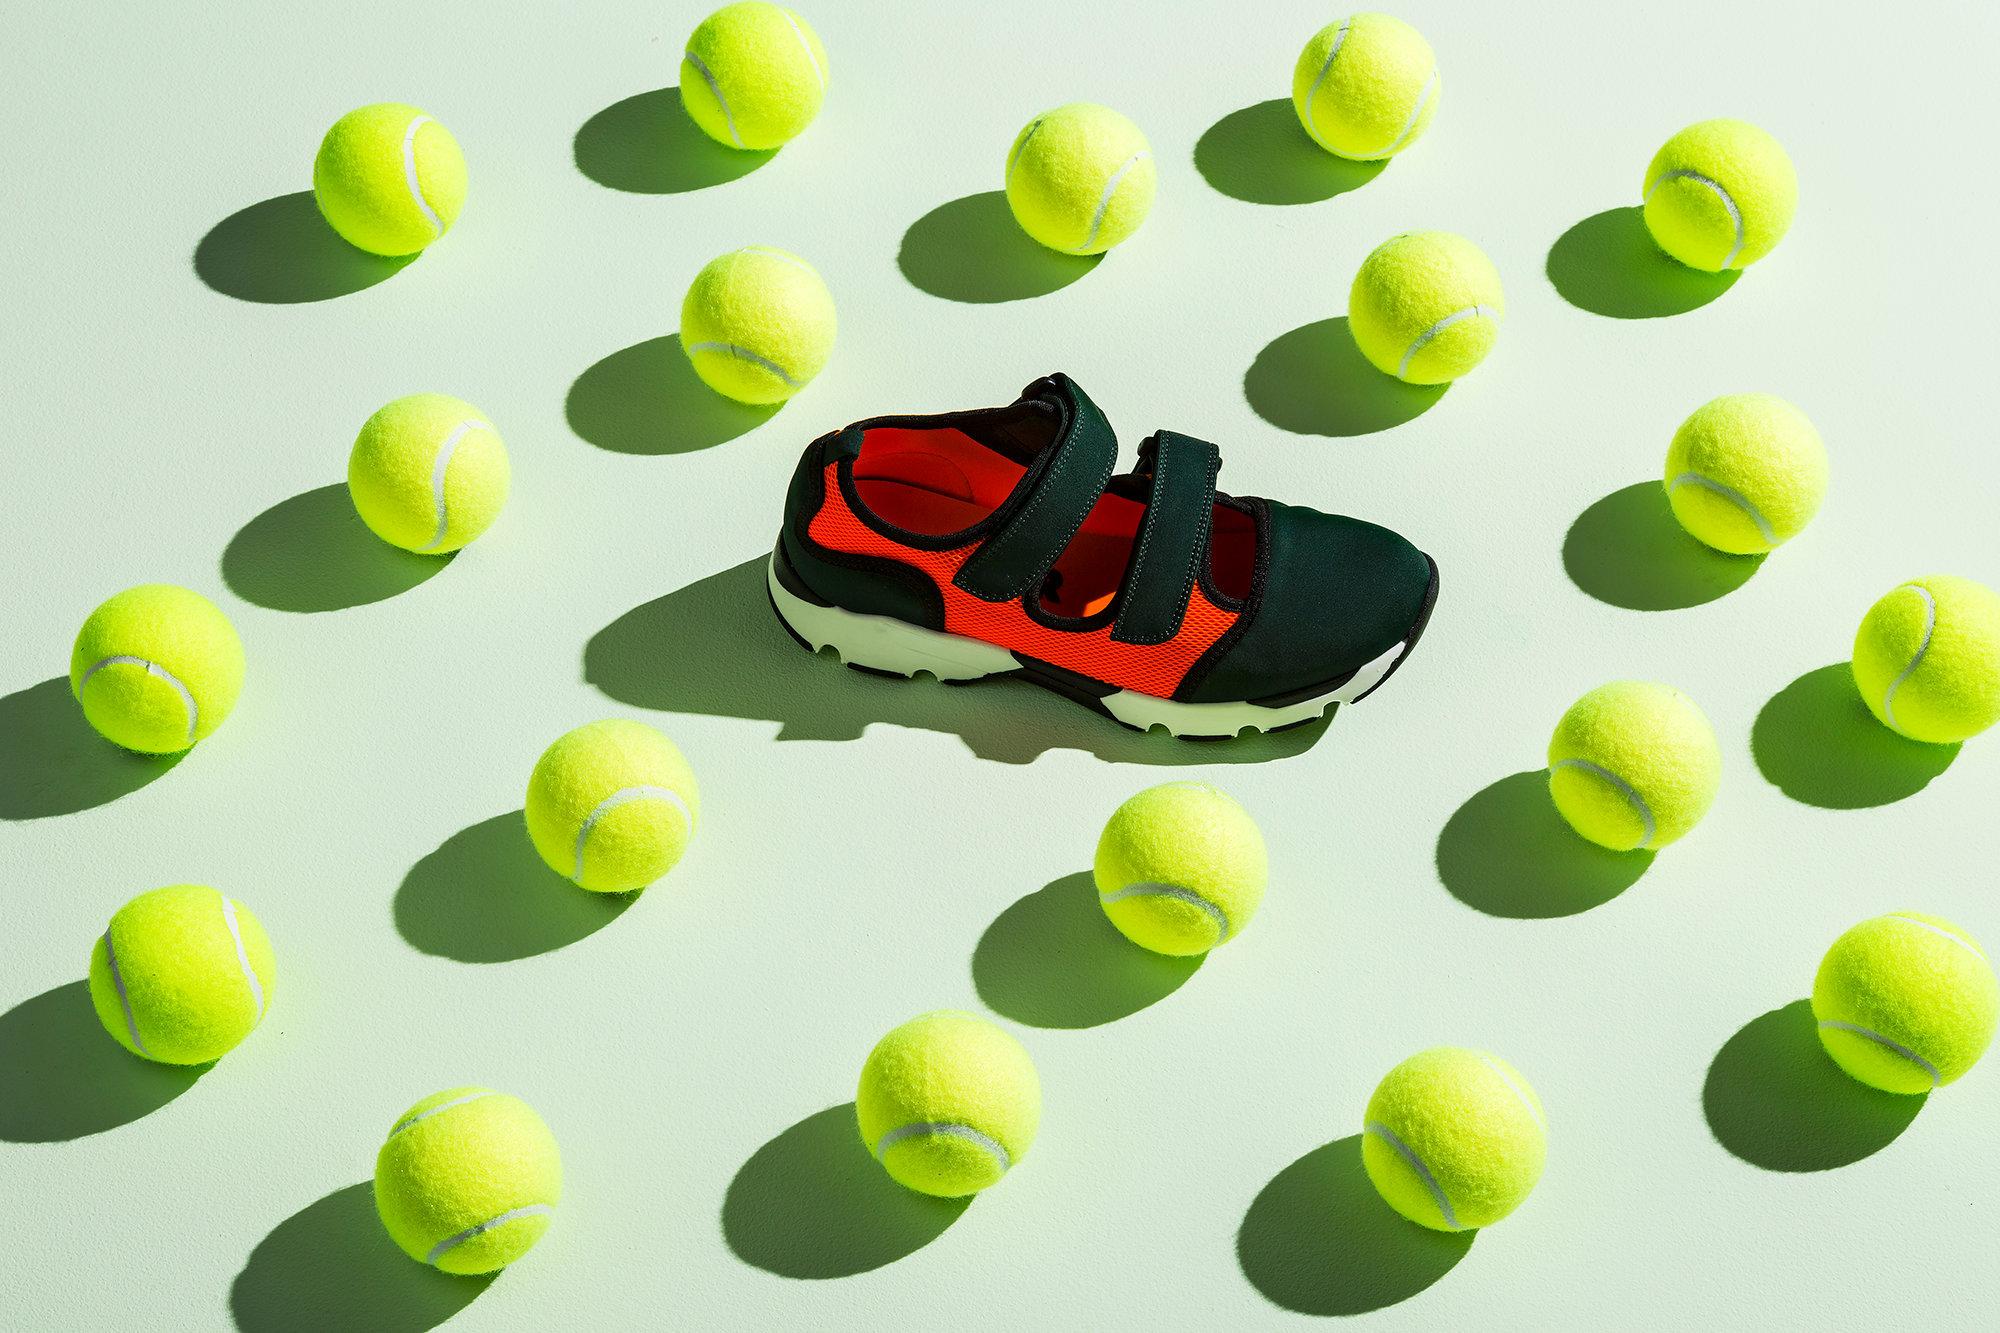 Marni_tennis balls_11.jpg